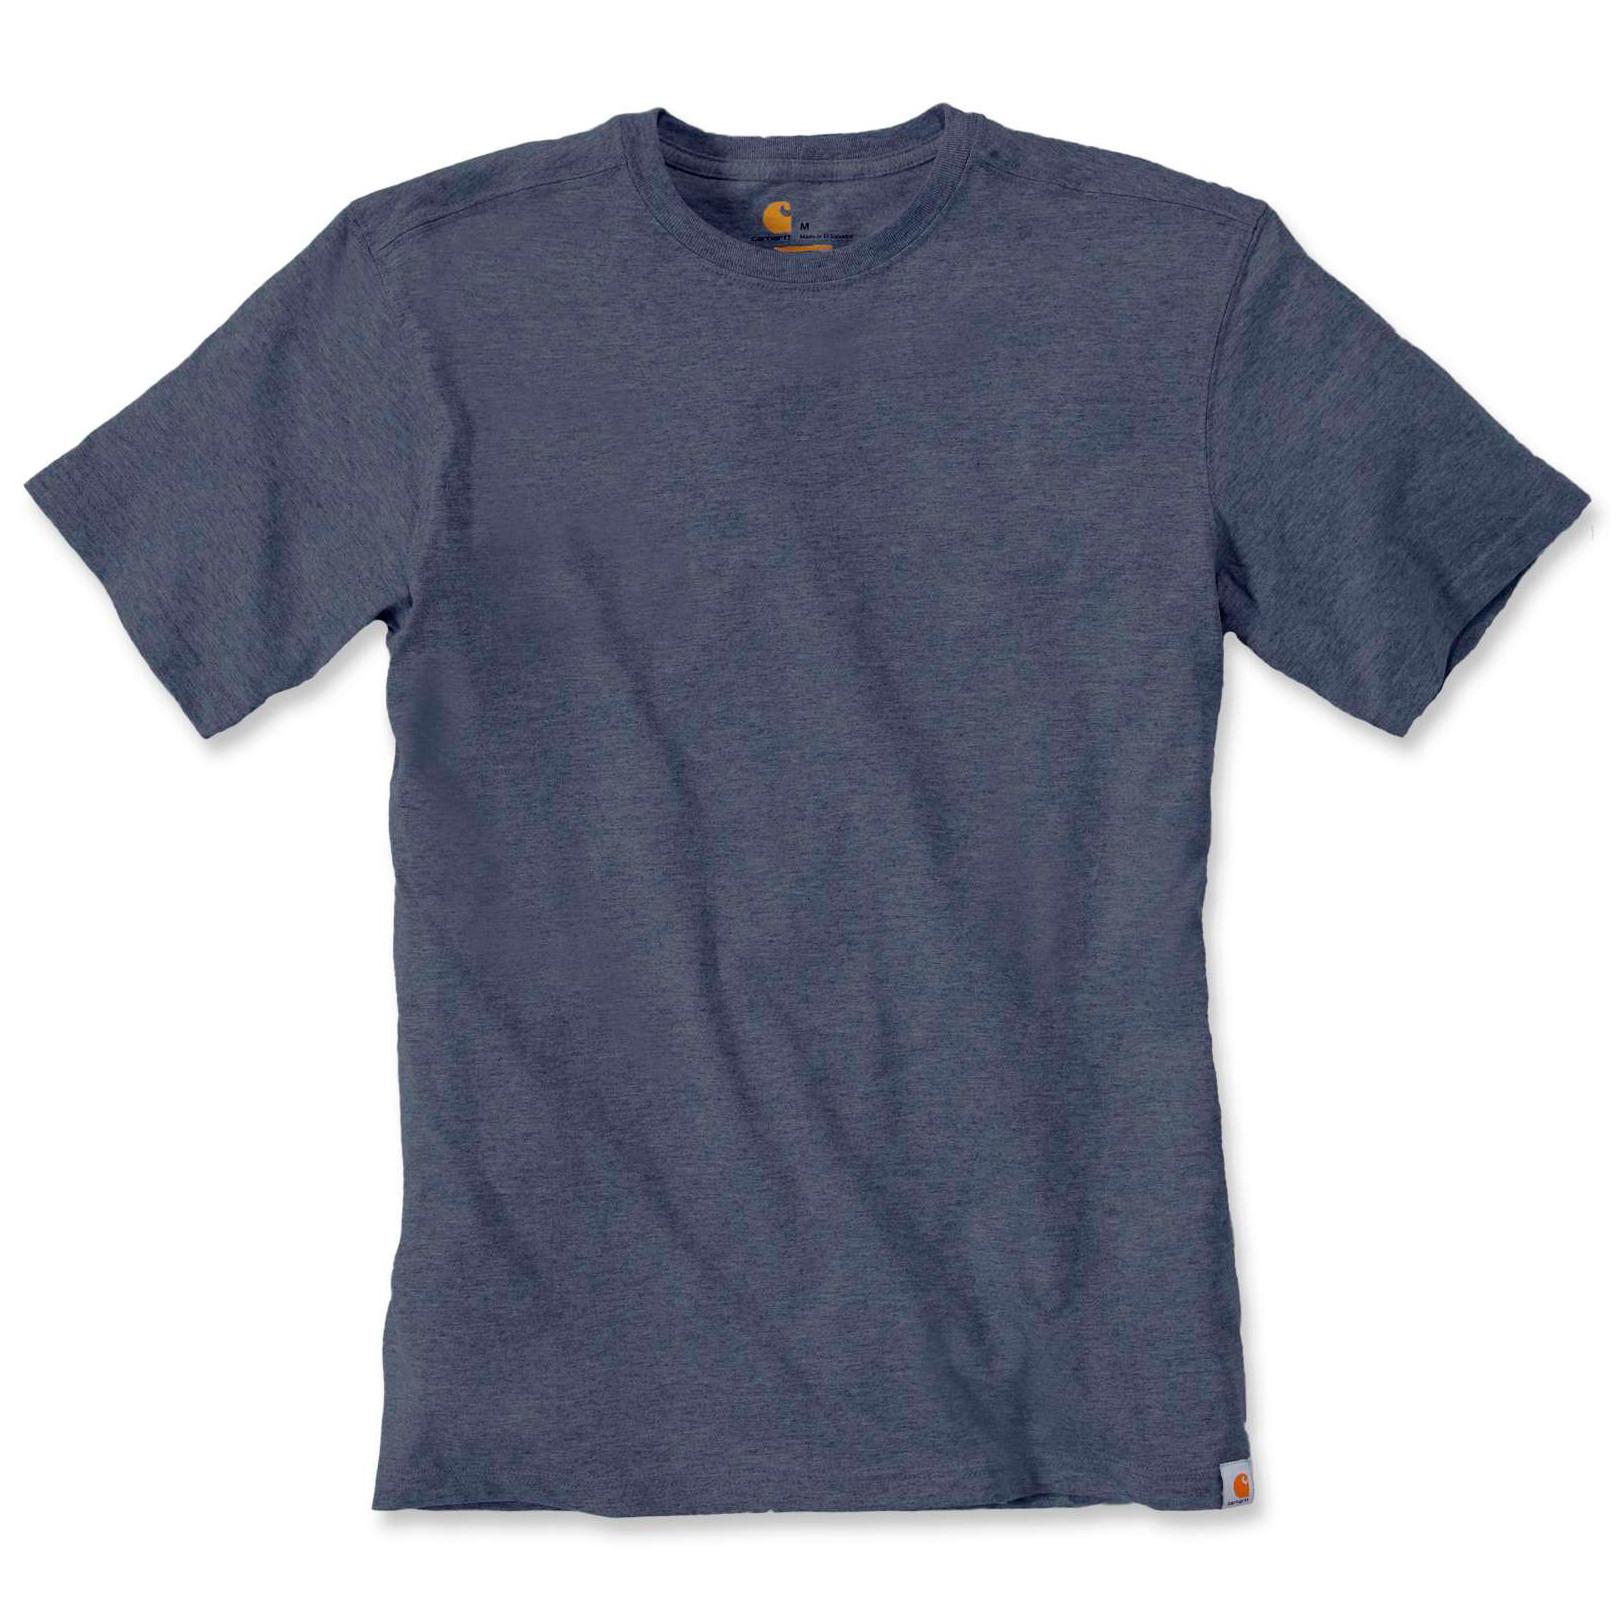 Футболка Carhartt Maddock T-Shirt S/S - 101124 (Indigo Heather, L)